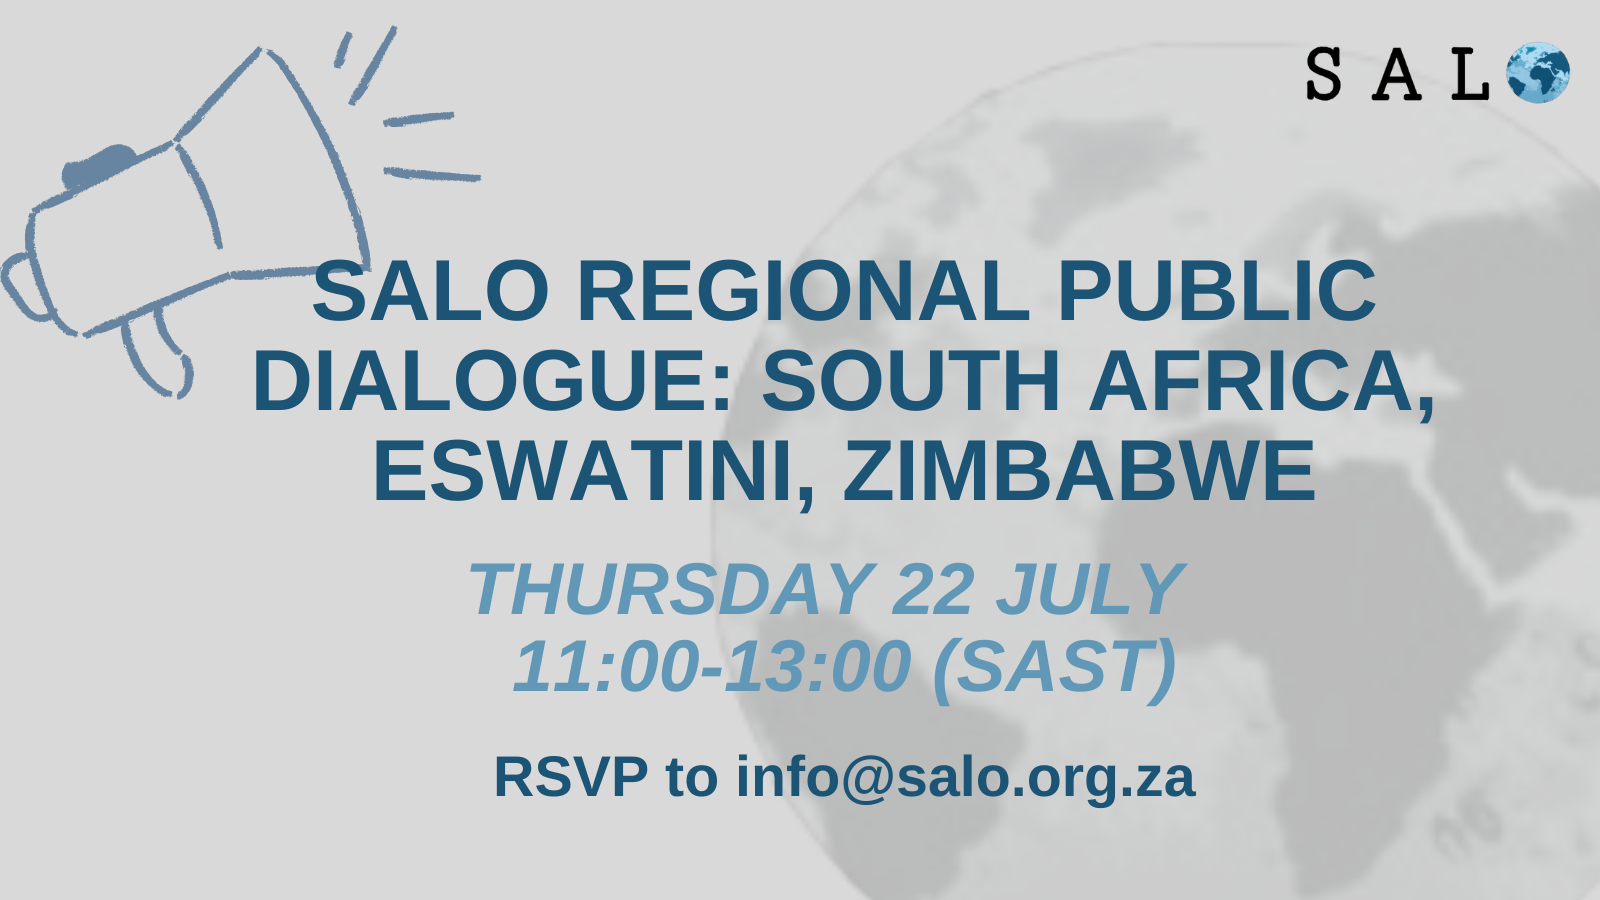 SALO Regional Public Dialogue: South Africa, eSwatini, Zimbabwe. – 22 July 2021